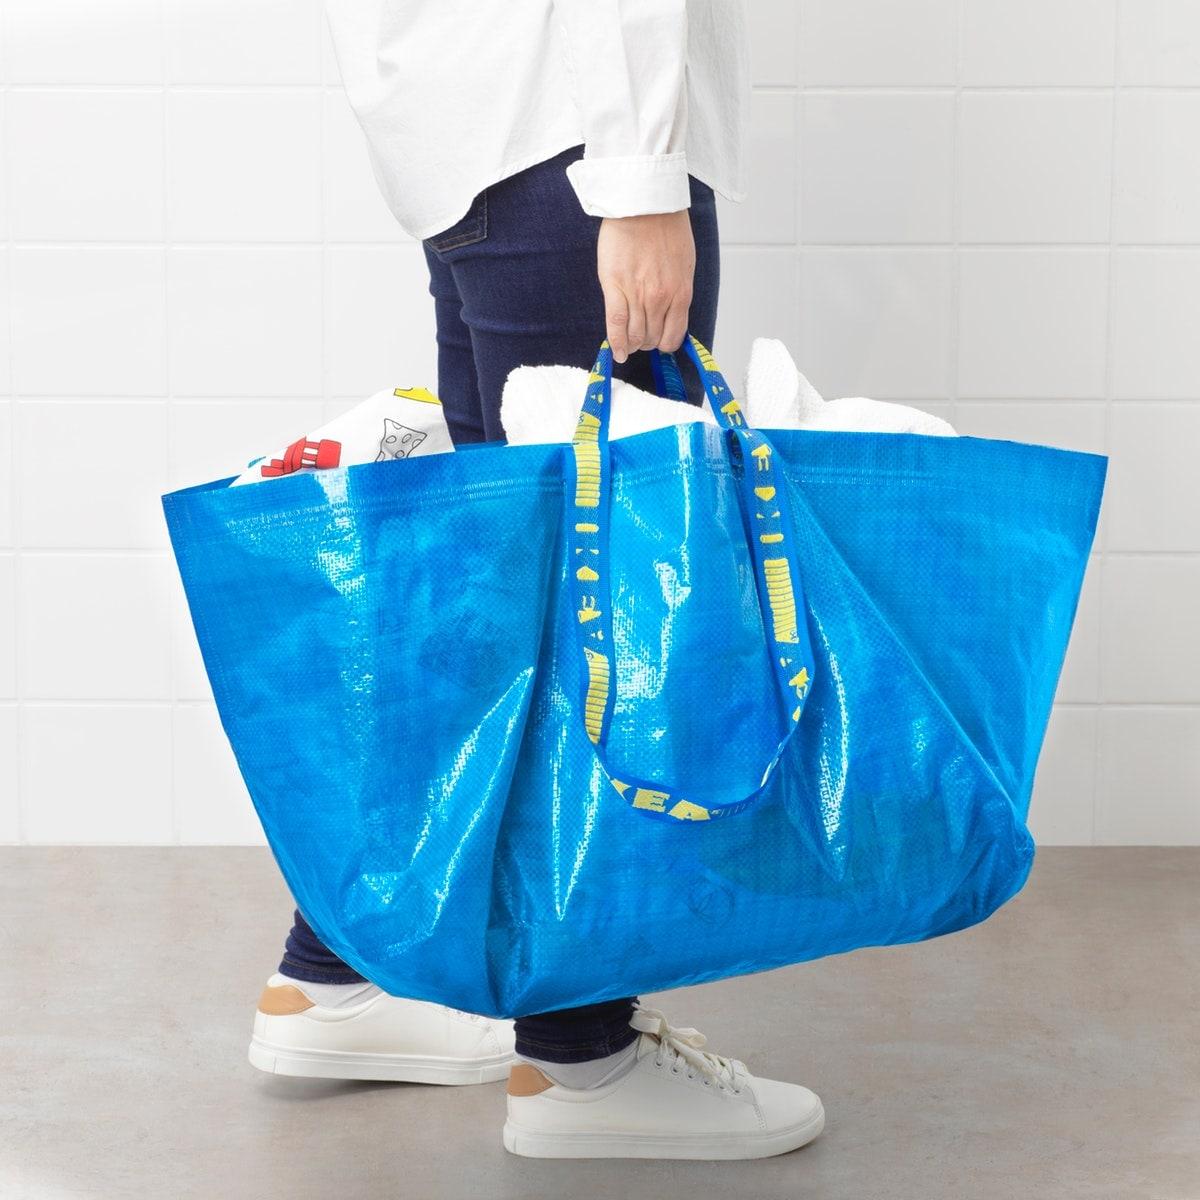 Un homme avec un sac bleu FRAKTA